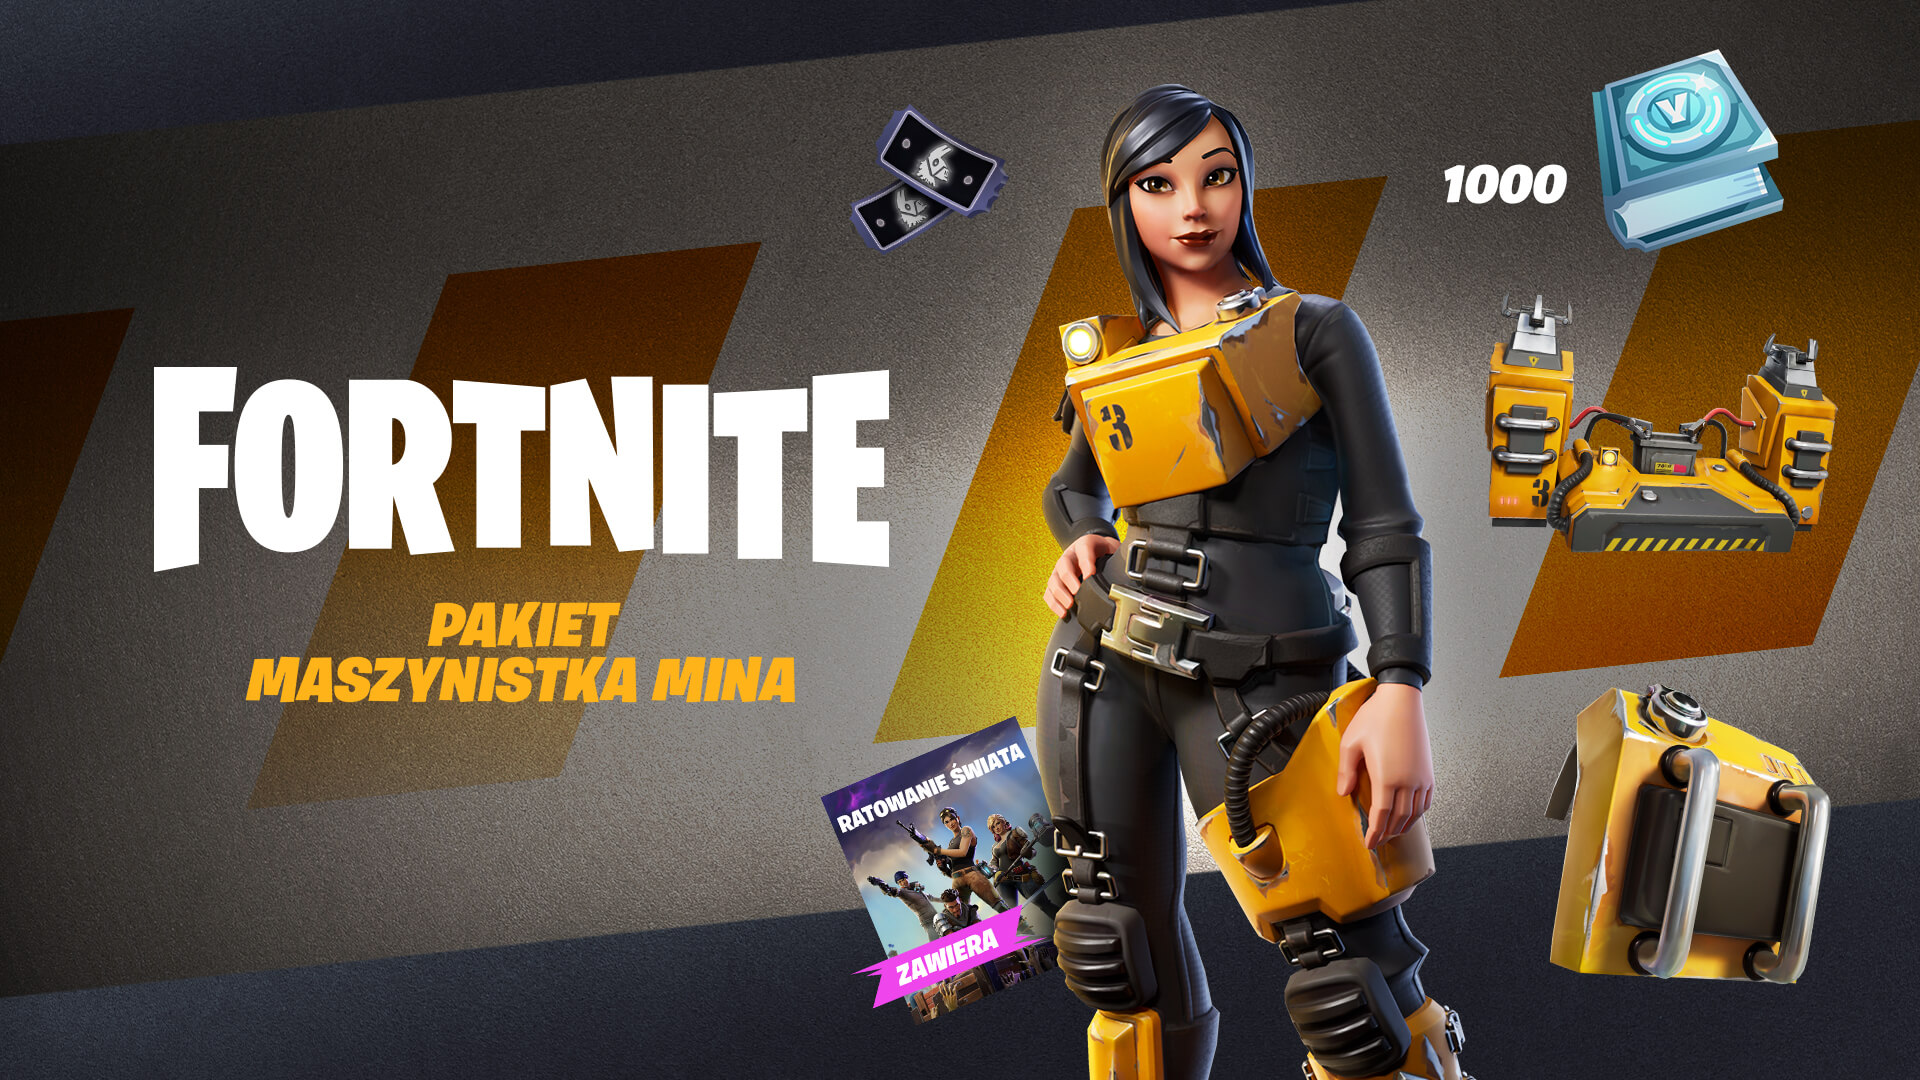 Fortnite Save The World Machinist Mina Pack PL